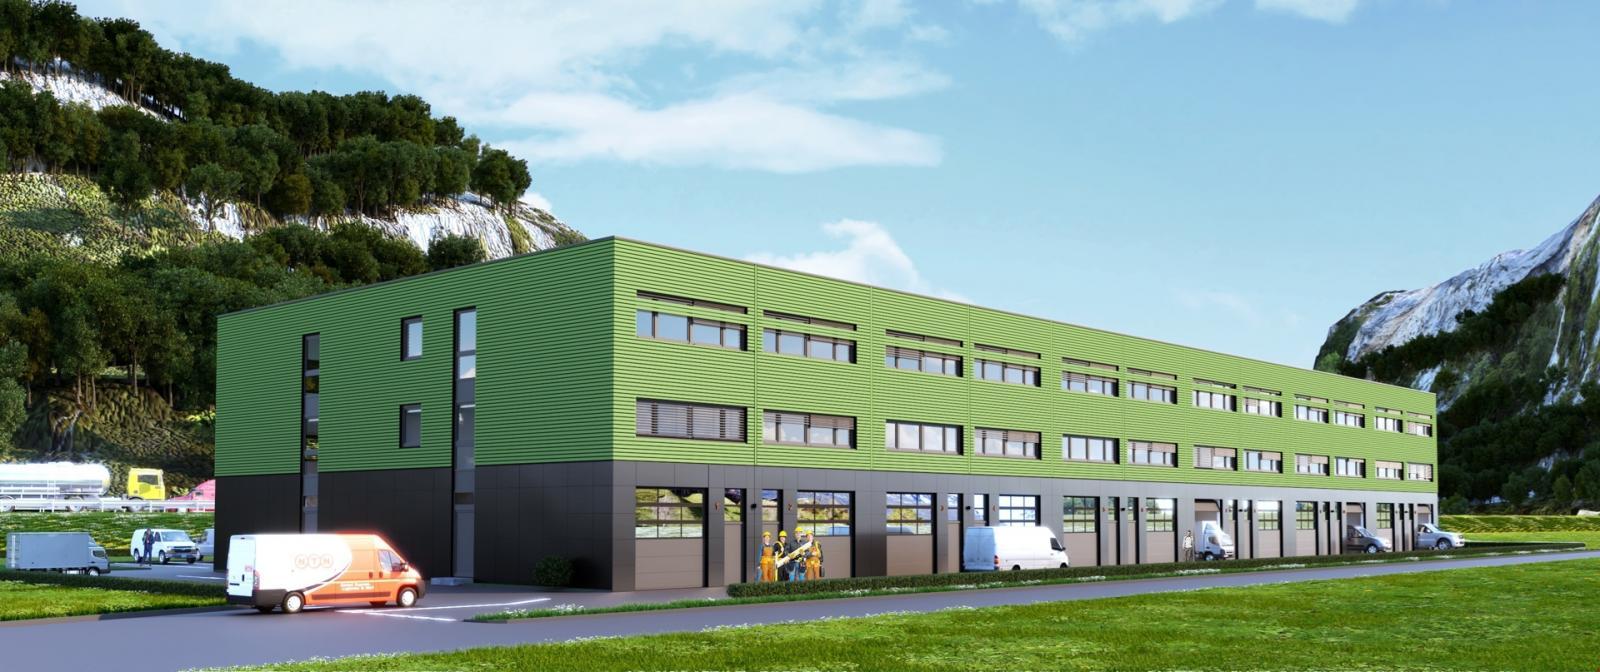 fabrikationsraeume-78751723-f